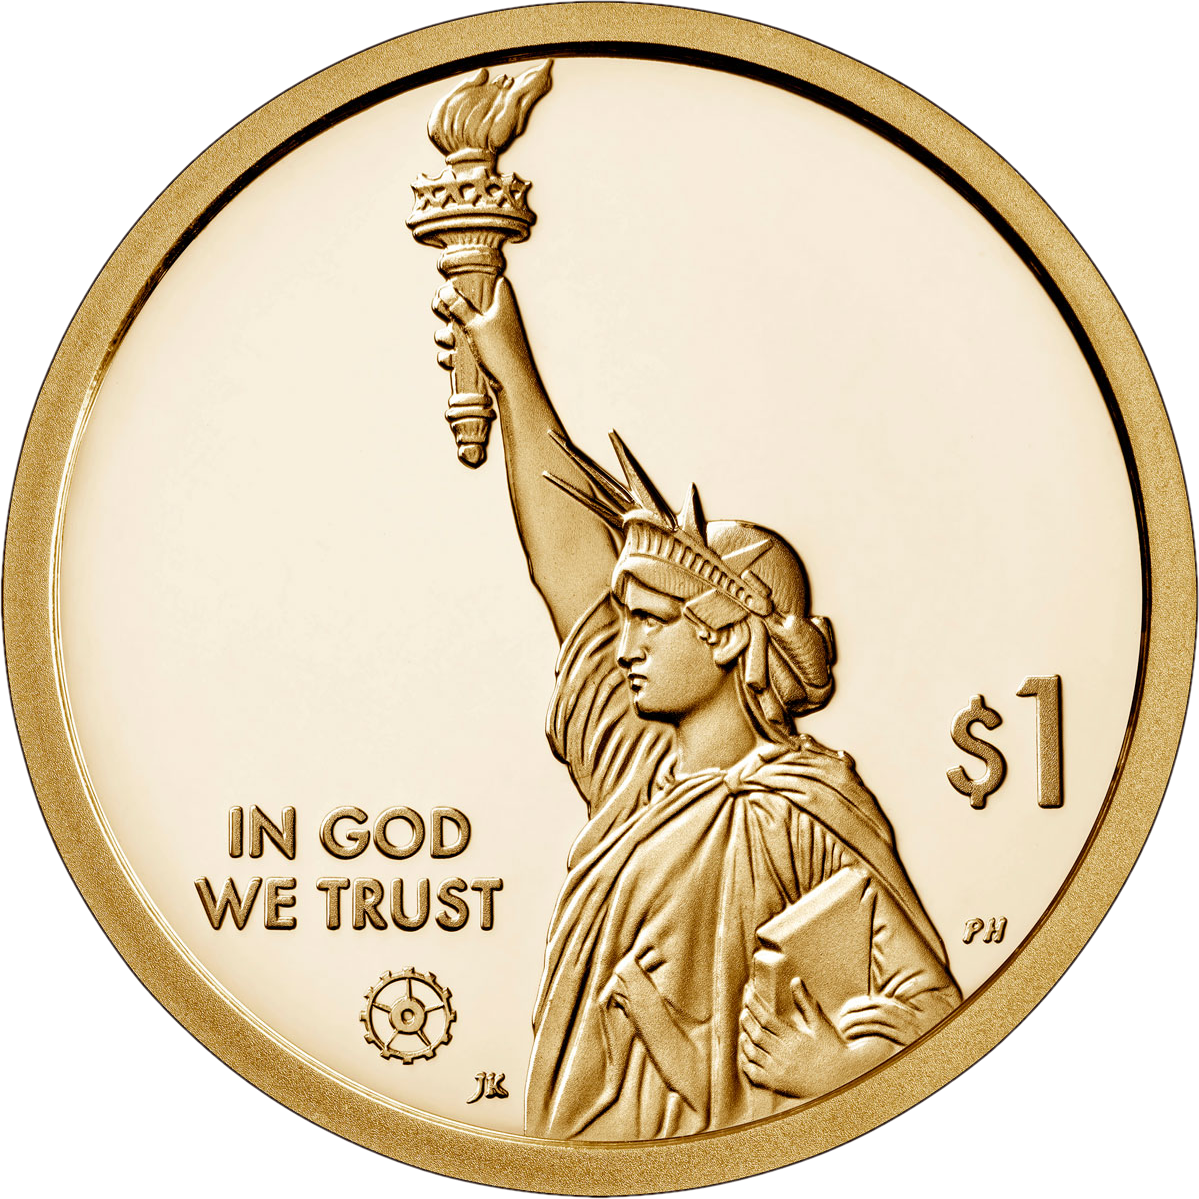 США монета 1 доллар 2020 года, аверс